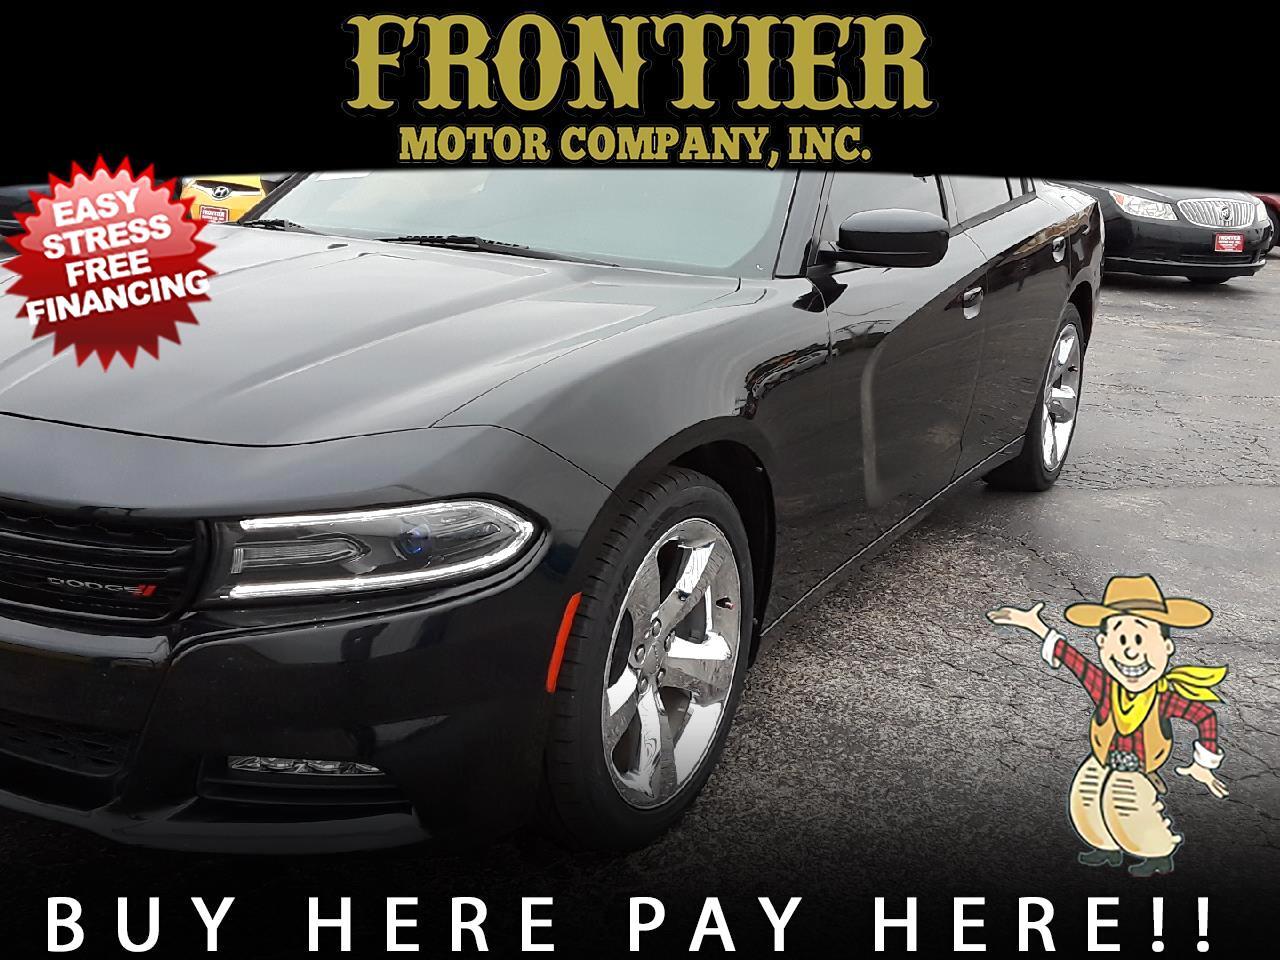 ujgtetro0ofidm https www frontiermotorcompany com